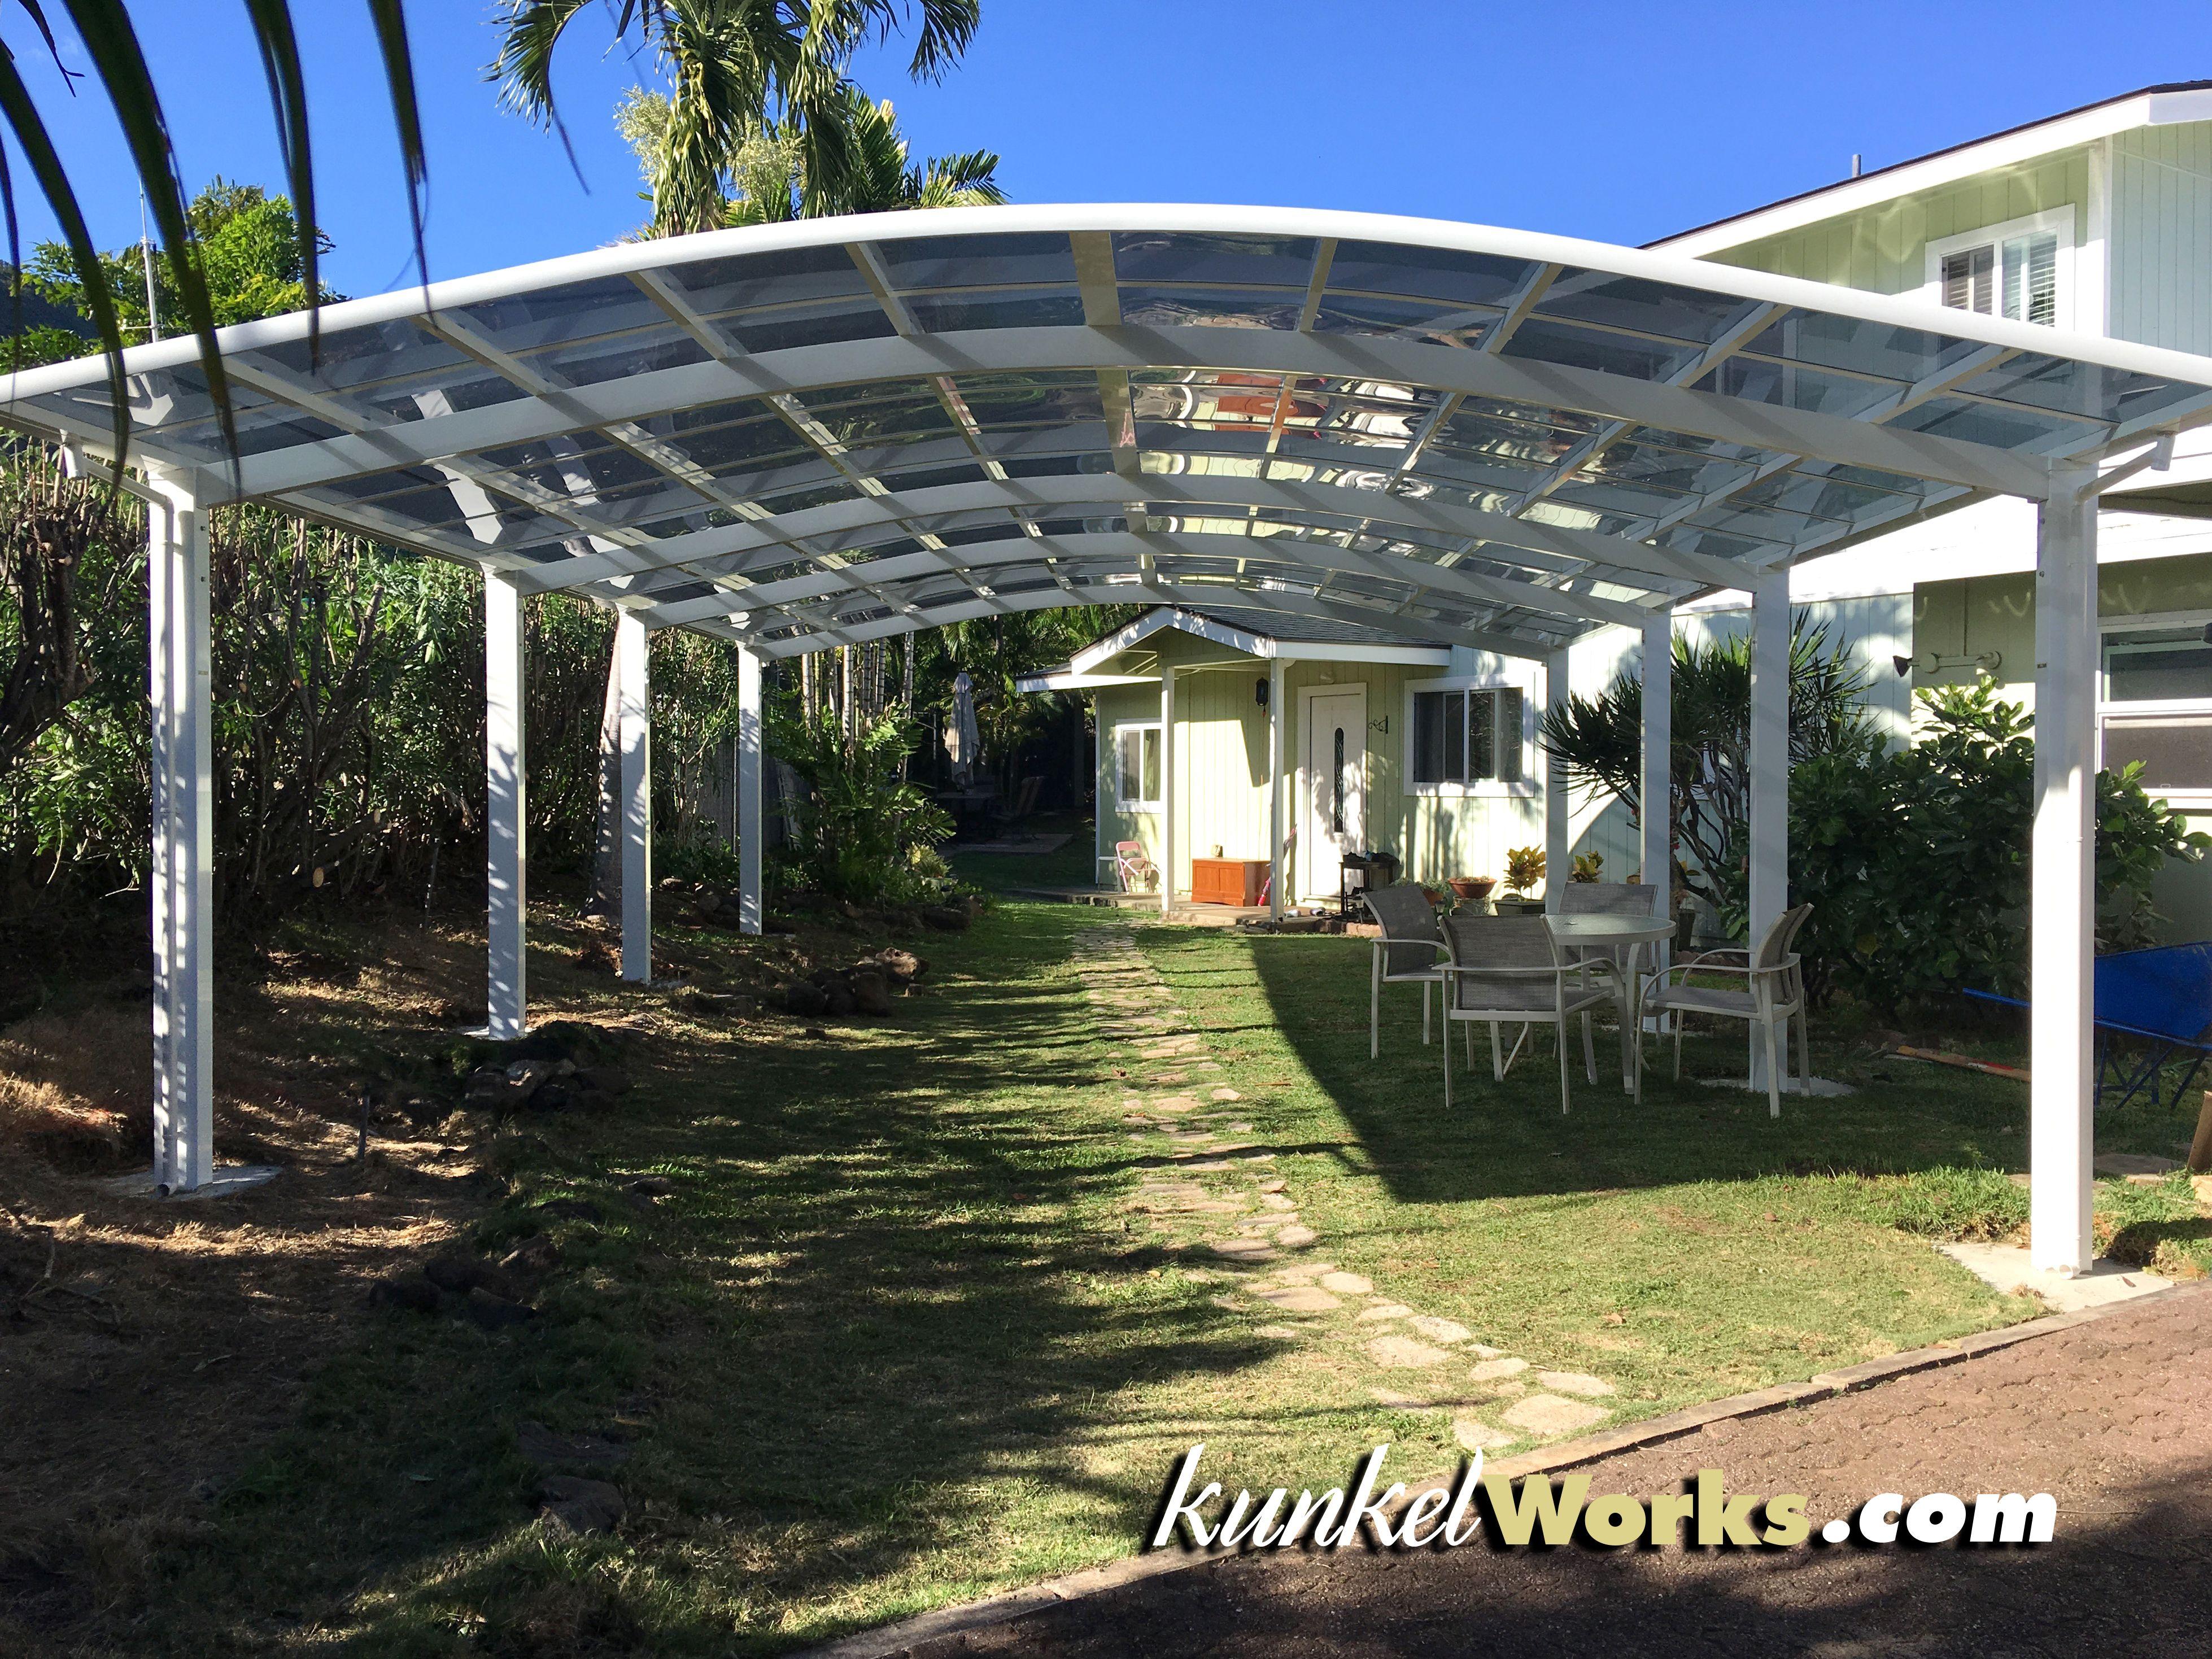 Join Two Carports To Create A Perfect Family Event Venue Aluminum Carport Aluminium Gates Outdoor Structures